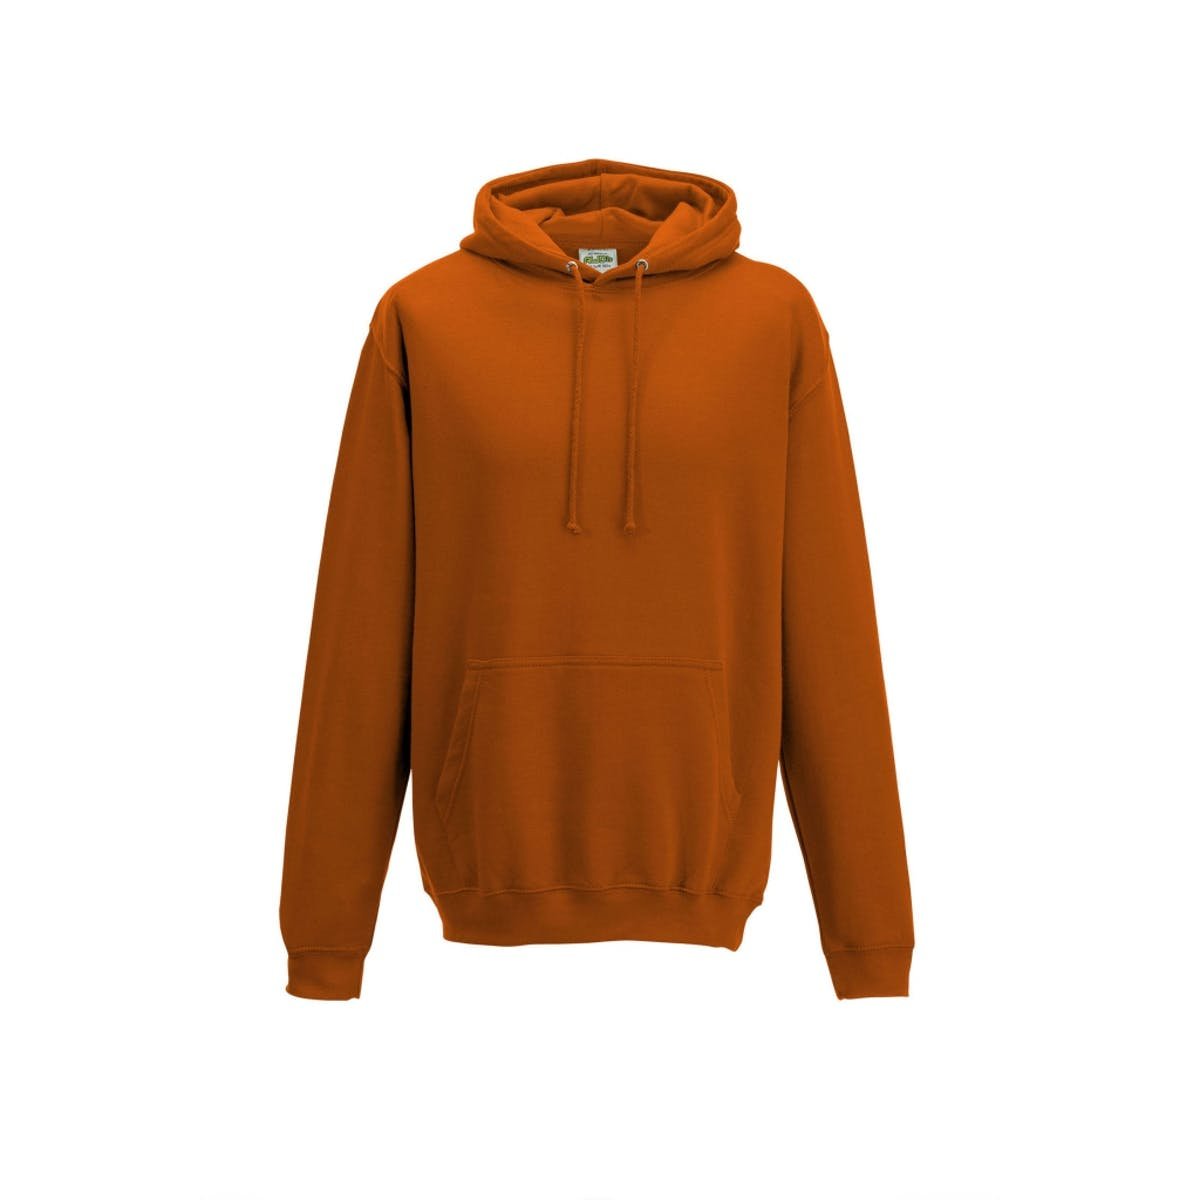 burnt orange smoke overhead college hoodies